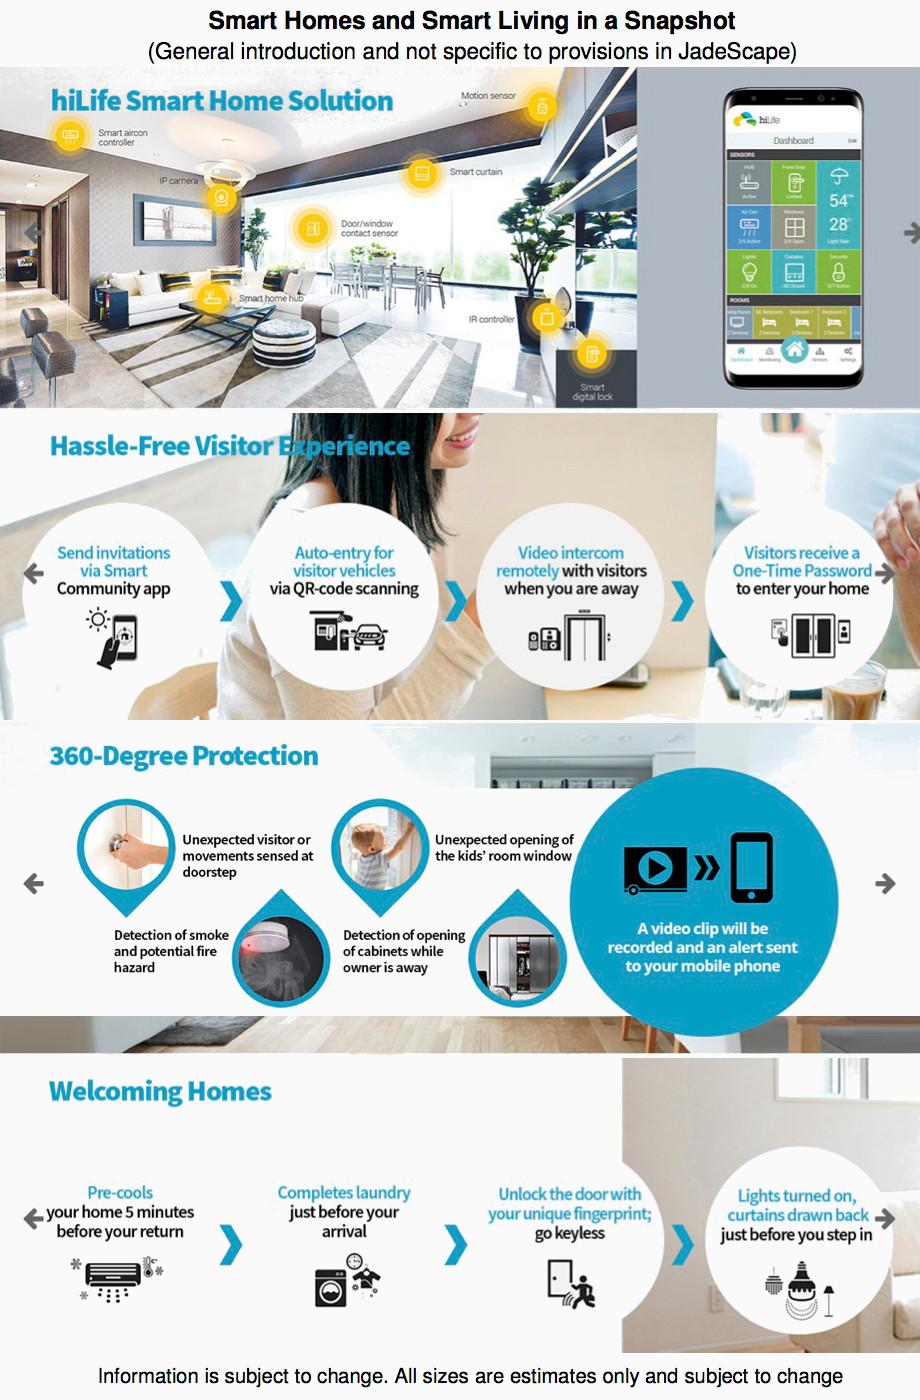 JadeScape Condo . About Smart Home Systems